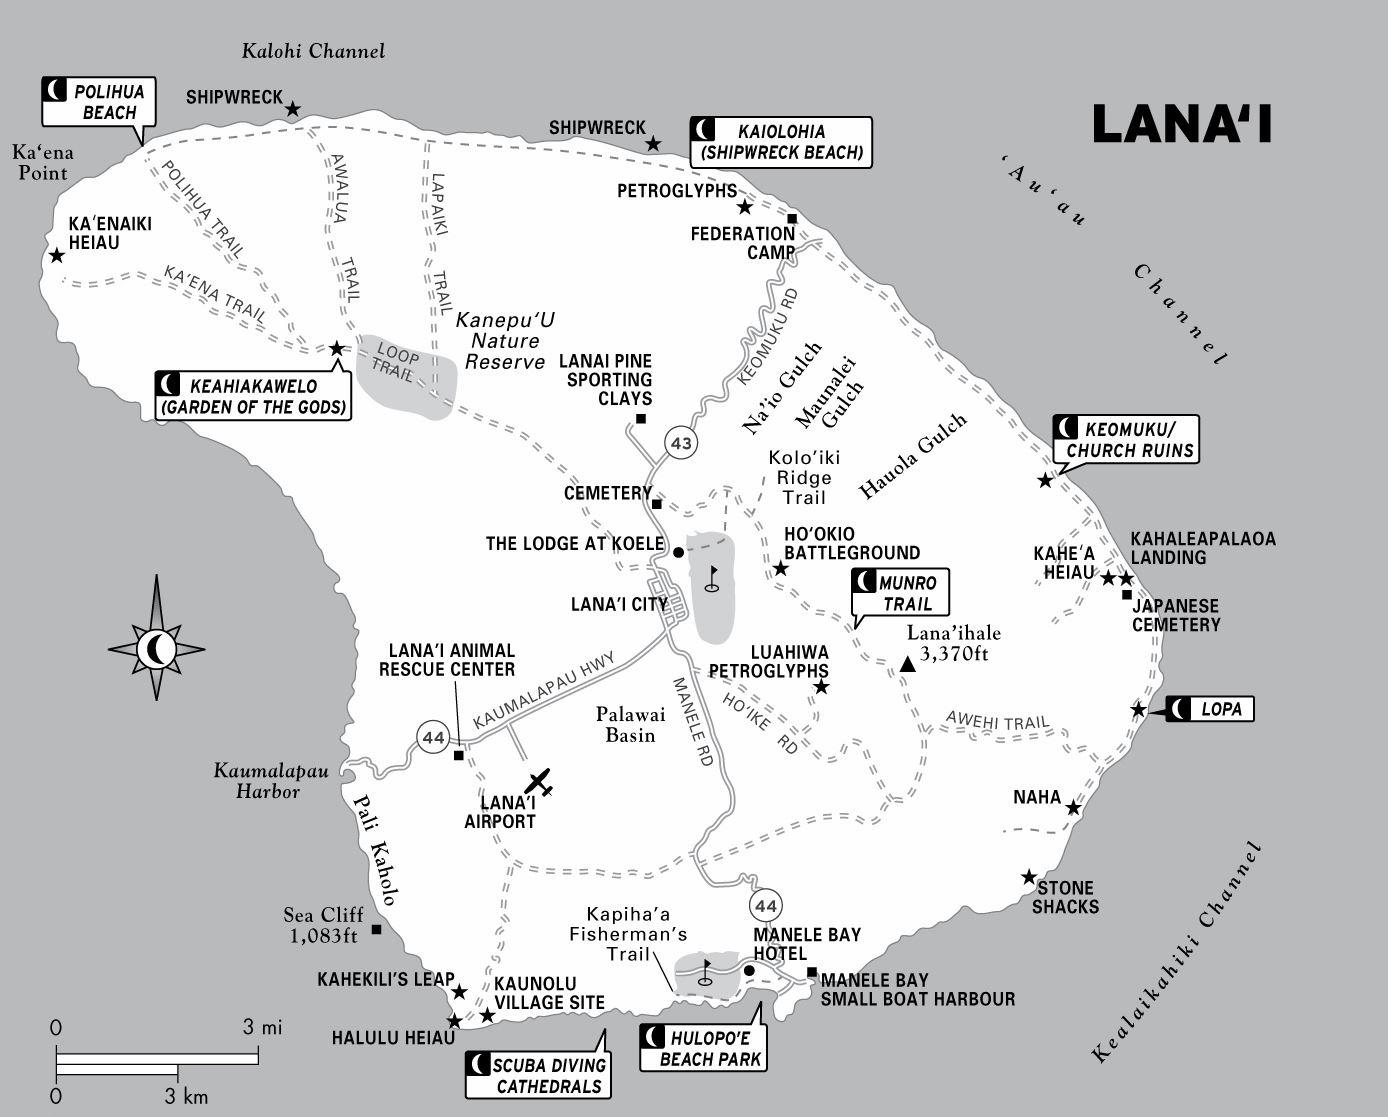 Large Lanai Maps For Free Download And Print | High-Resolution And - Printable Driving Map Of Kauai